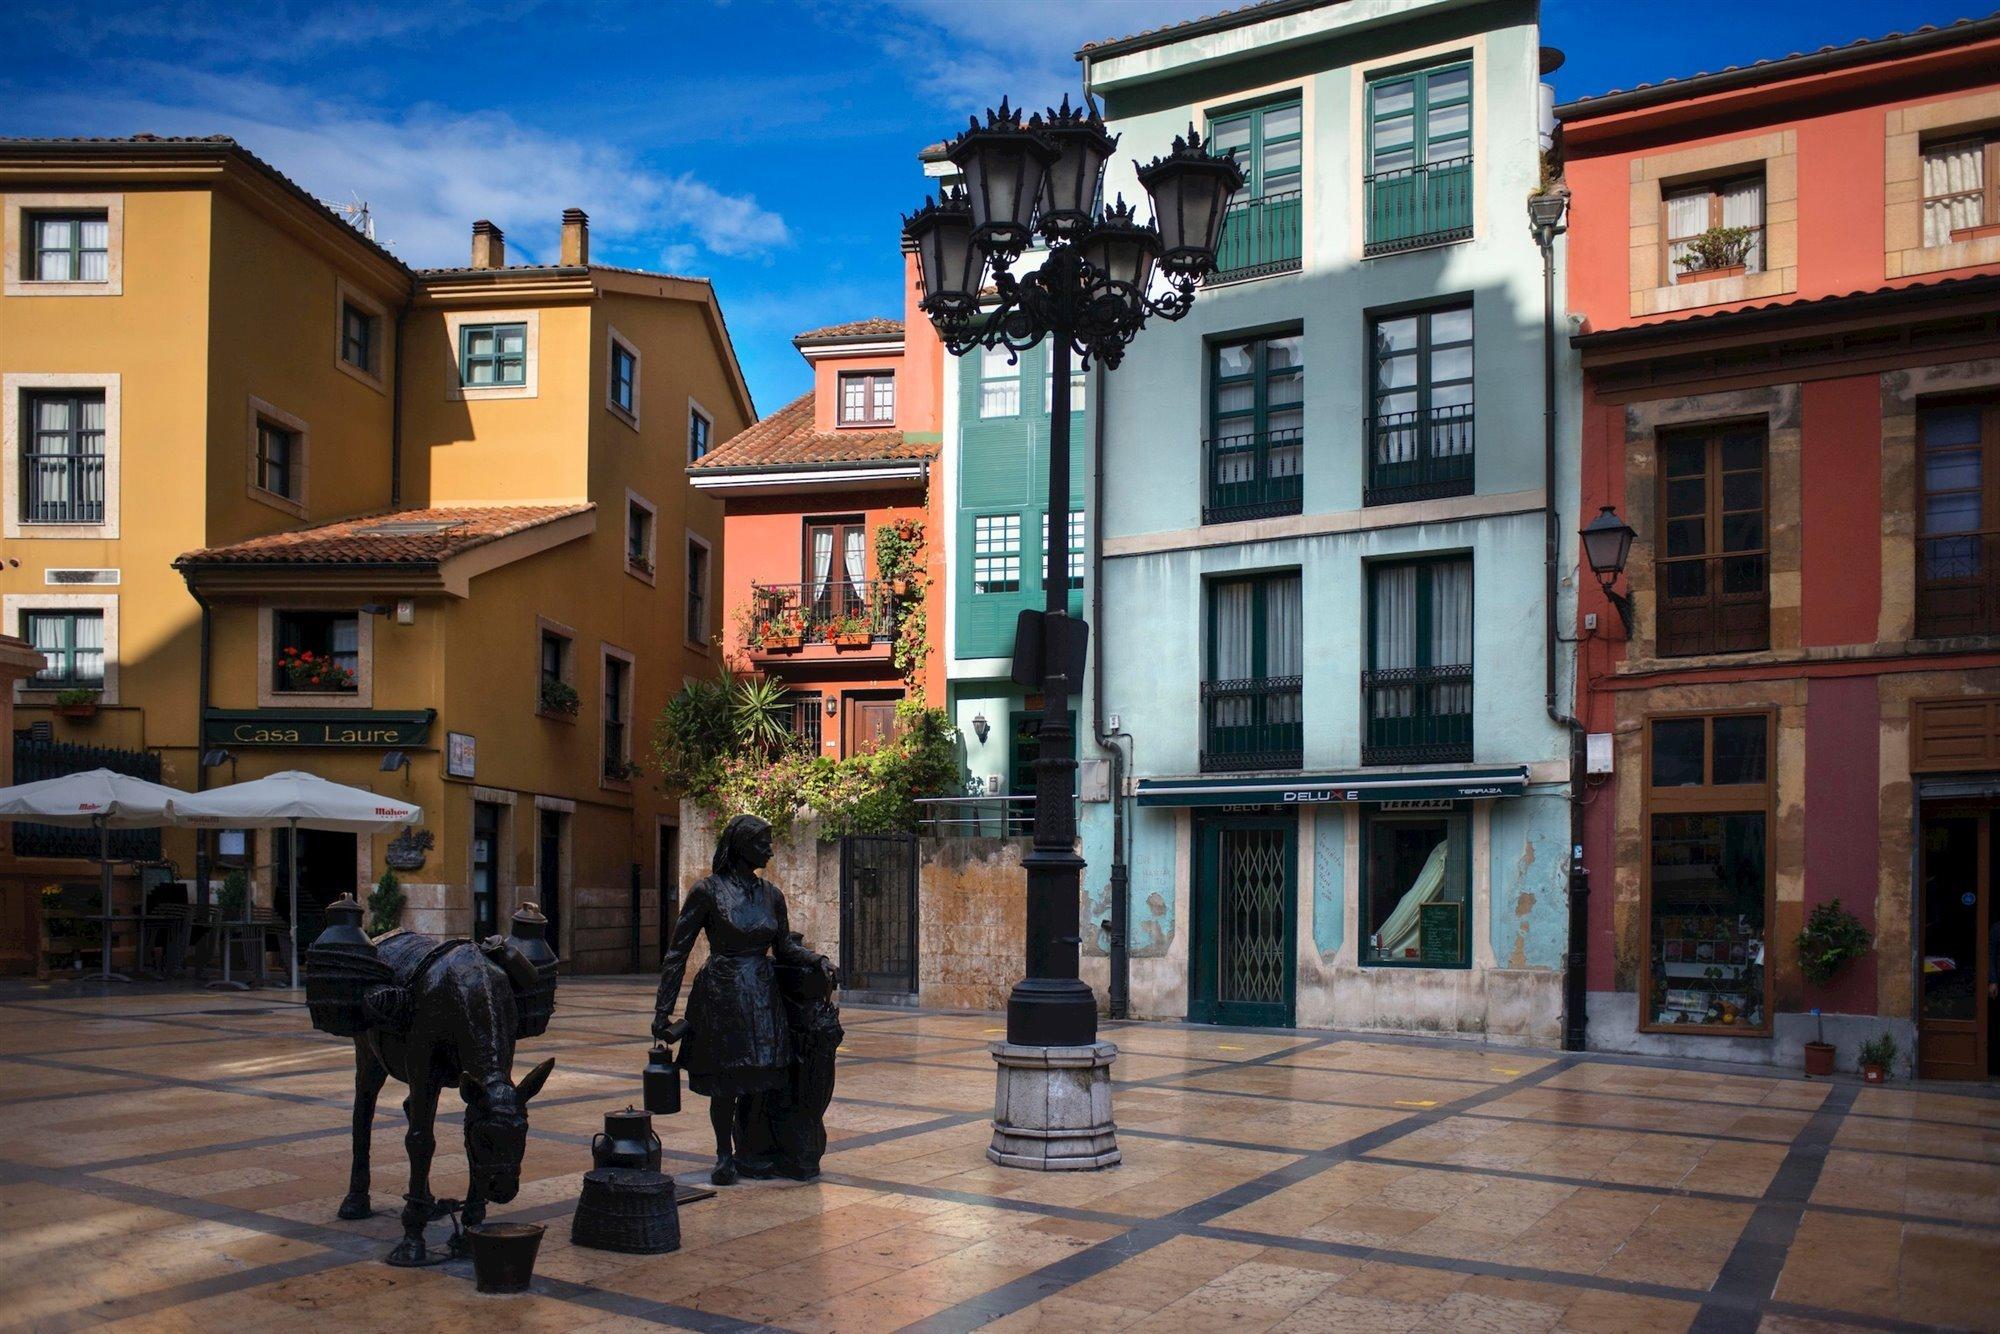 juderia oviedo. Plaza Trascorrales, Oviedo